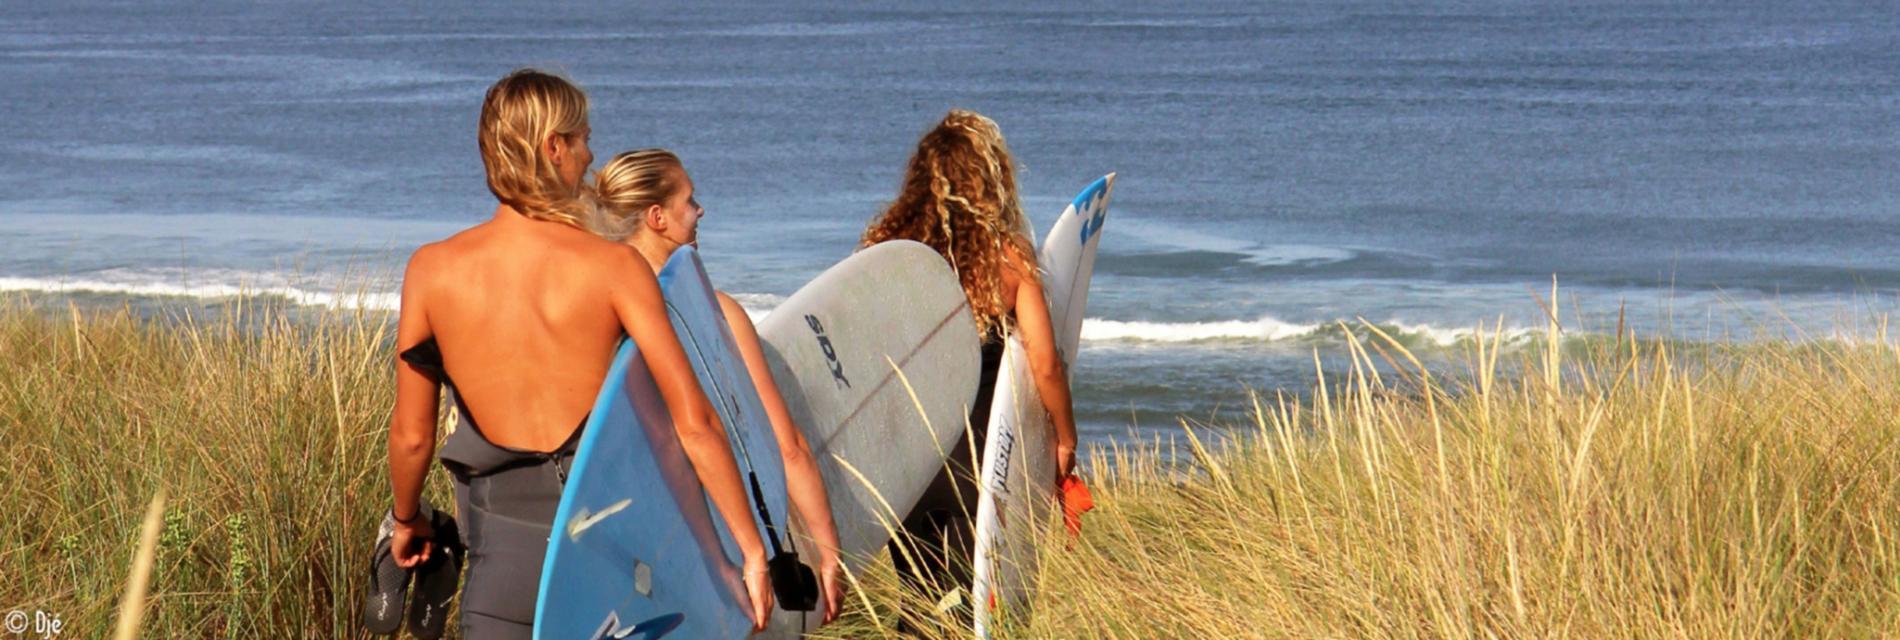 Slide Sortie surf